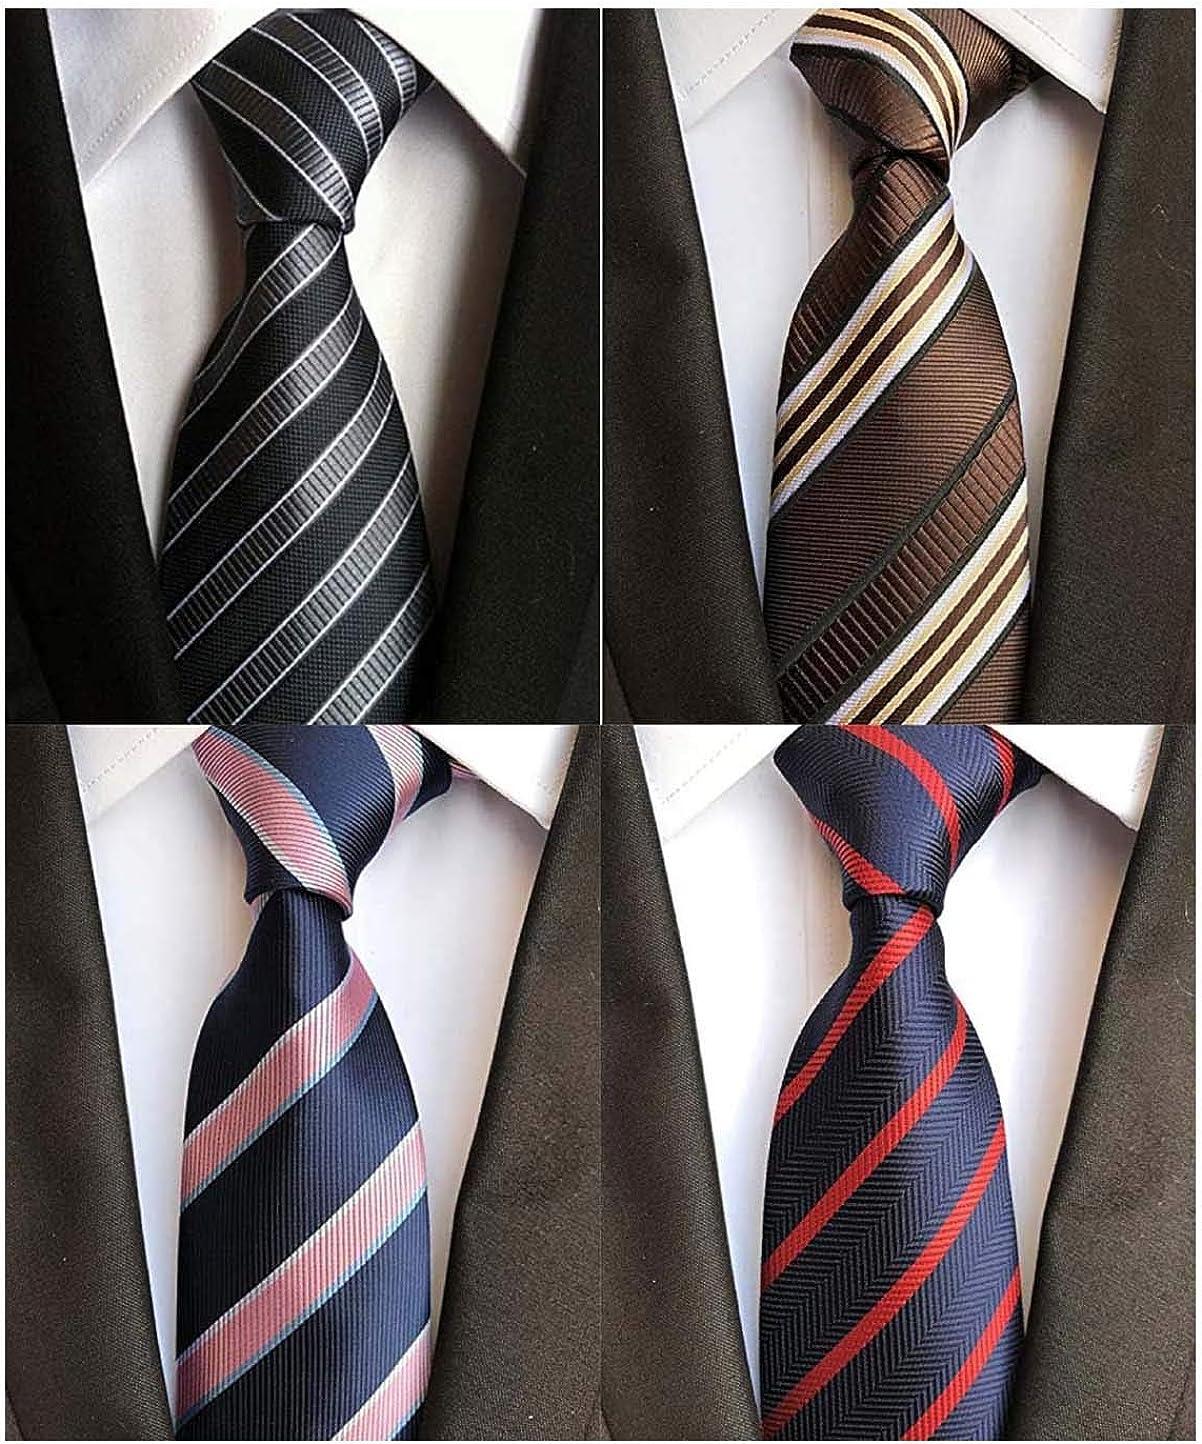 WeiShang Lot 6 PCS 4 inch Classic Men's Wide Tie Necktie Woven JACQUARD Neck Ties (Style 08), Medium